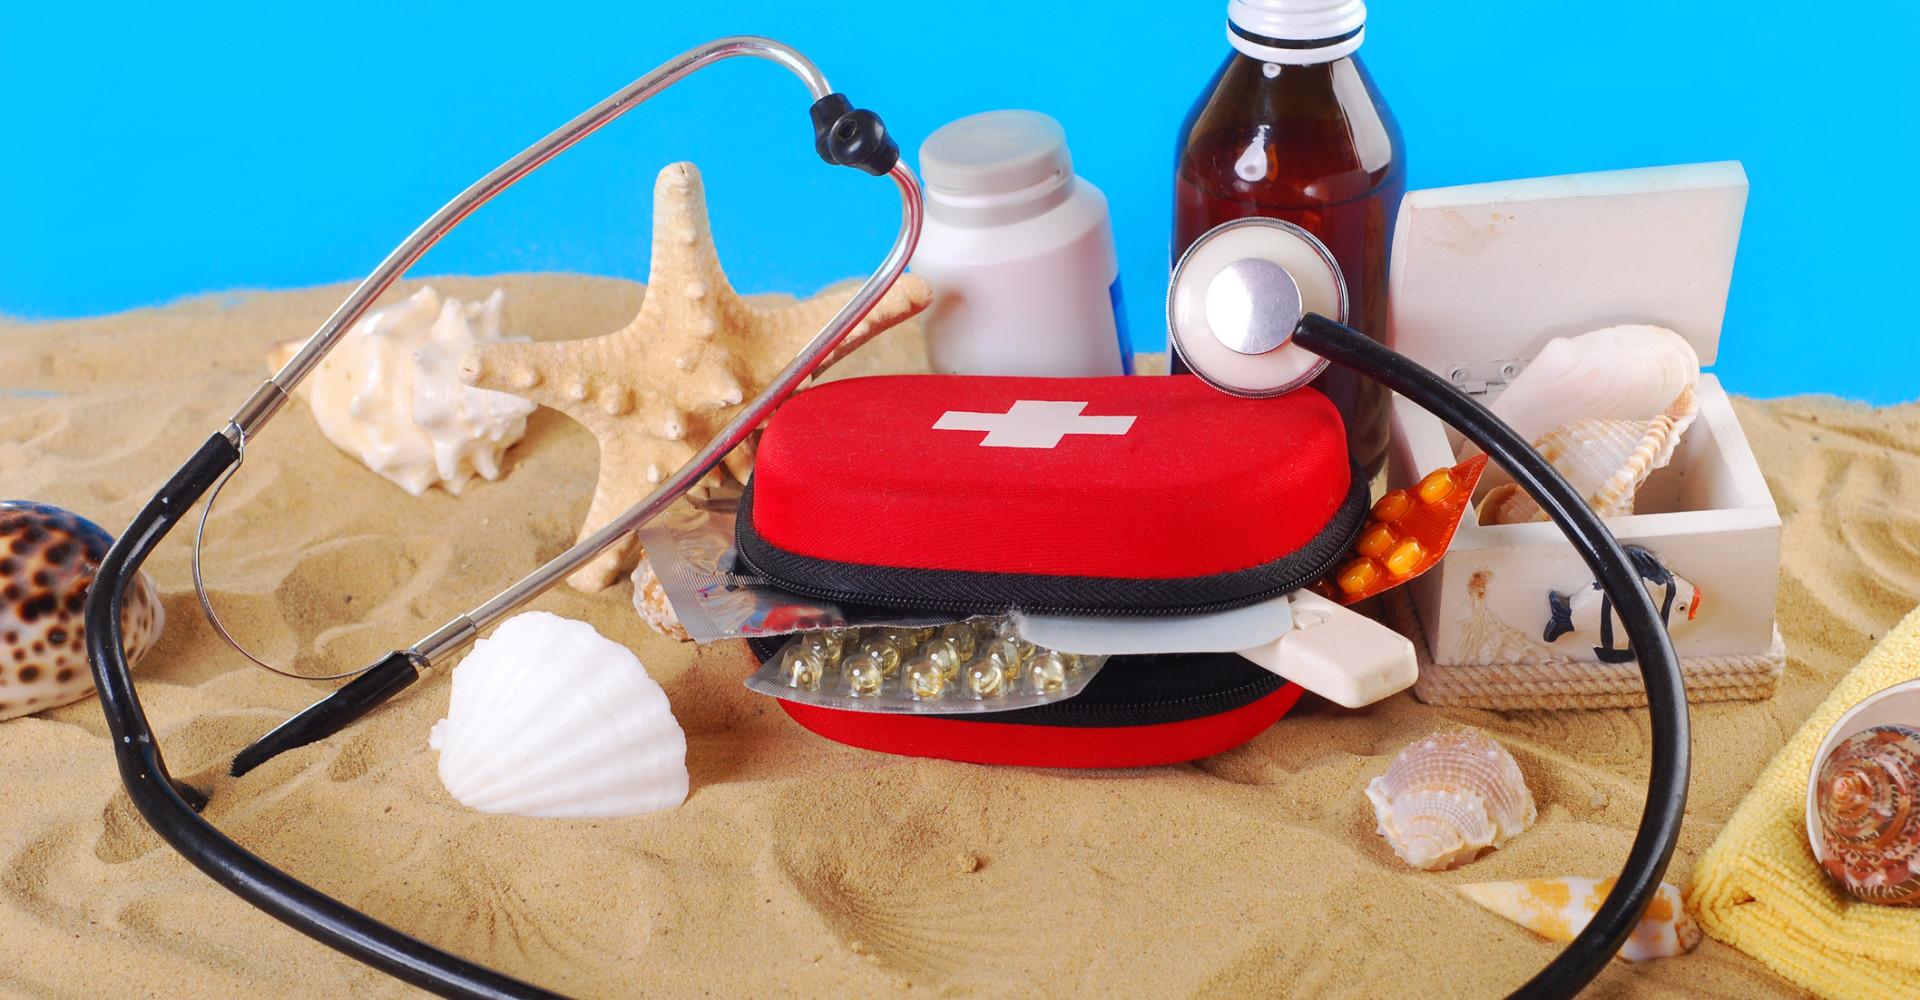 Krank im Urlaub? Fünf Überlebensstrategien